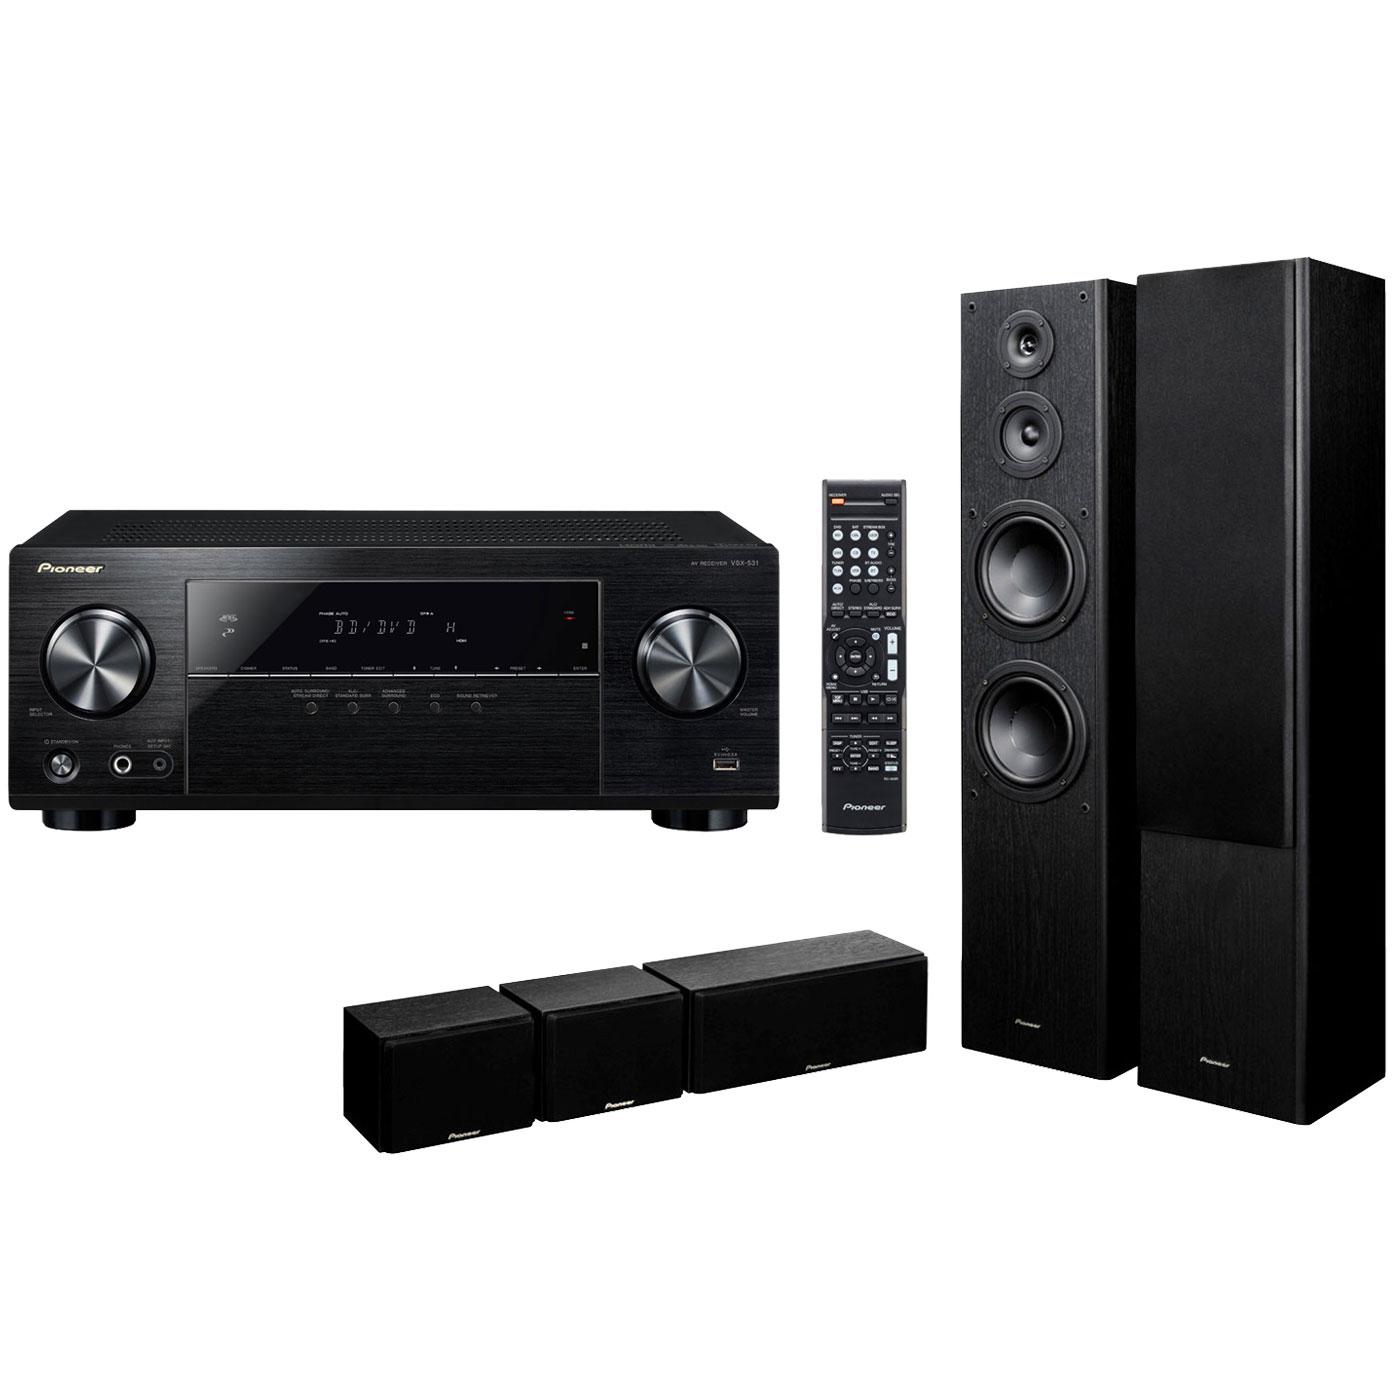 Ensemble home cinéma Pioneer VSX-531B + S-ES3TB Ampli-tuner Home Cinéma 5.1 Bluetooth, HDCP 2.2, et Upscaling Ultra HD 4K avec 4 entrées HDMI + Pack d'enceintes 5.0